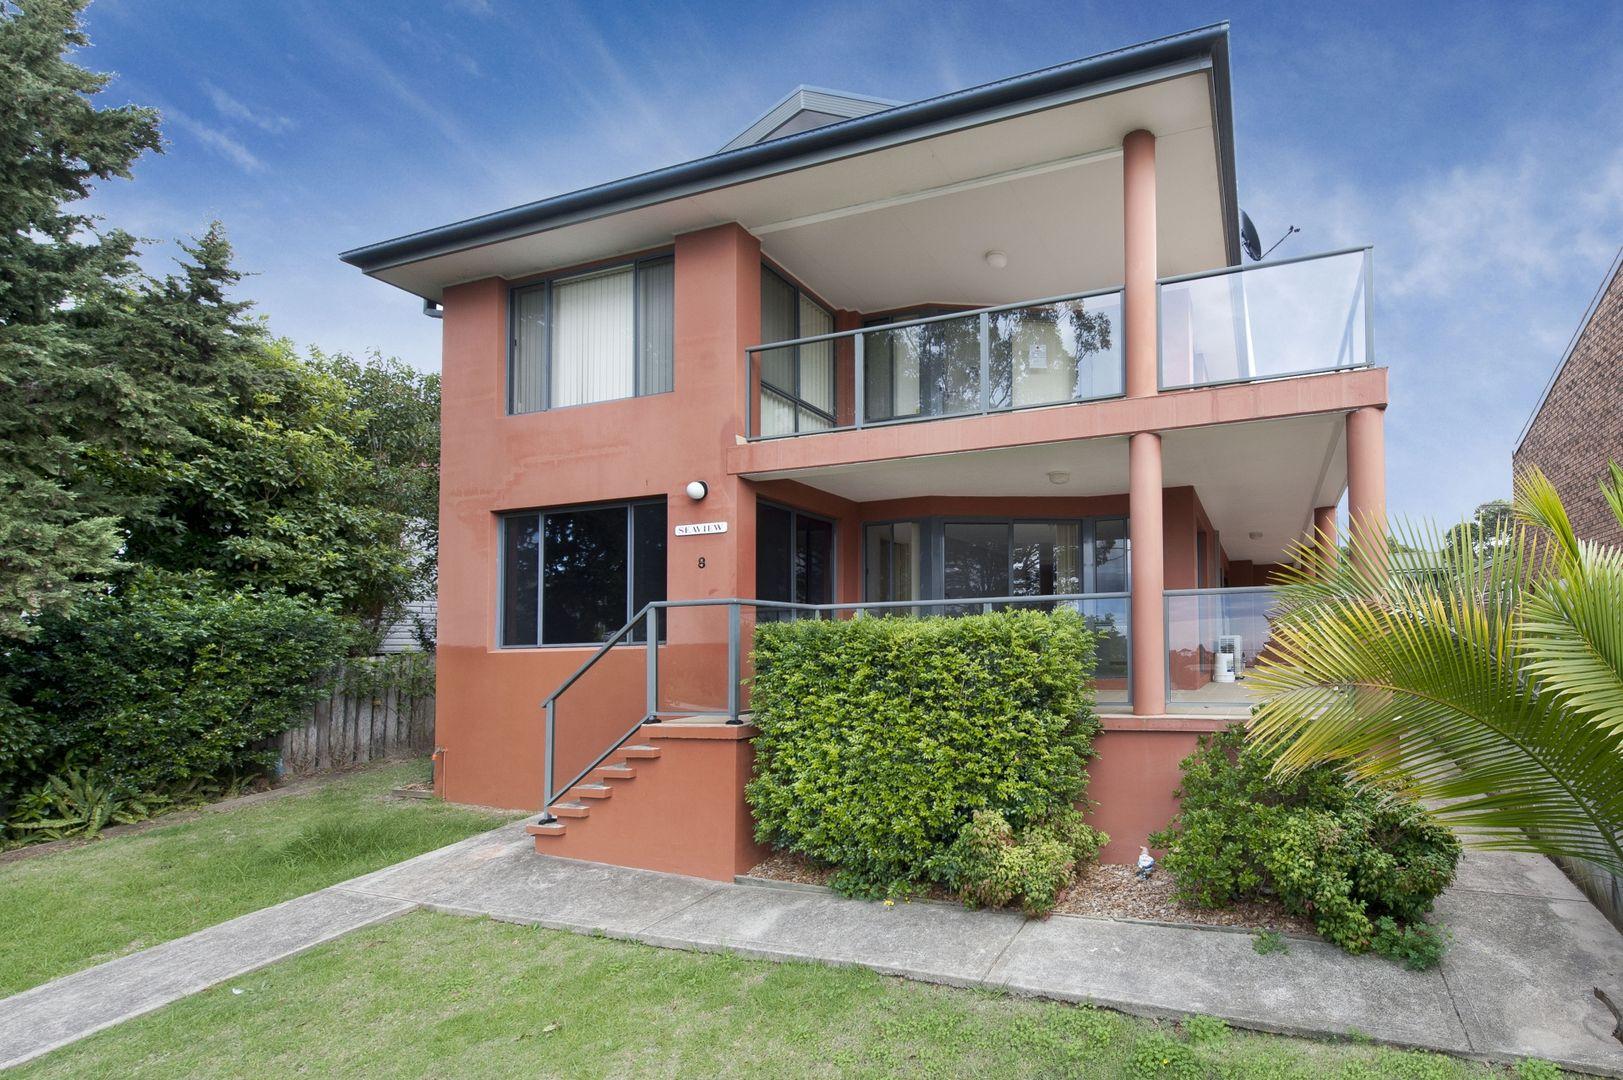 2/8 Pacific  Street, Batemans Bay NSW 2536, Image 0